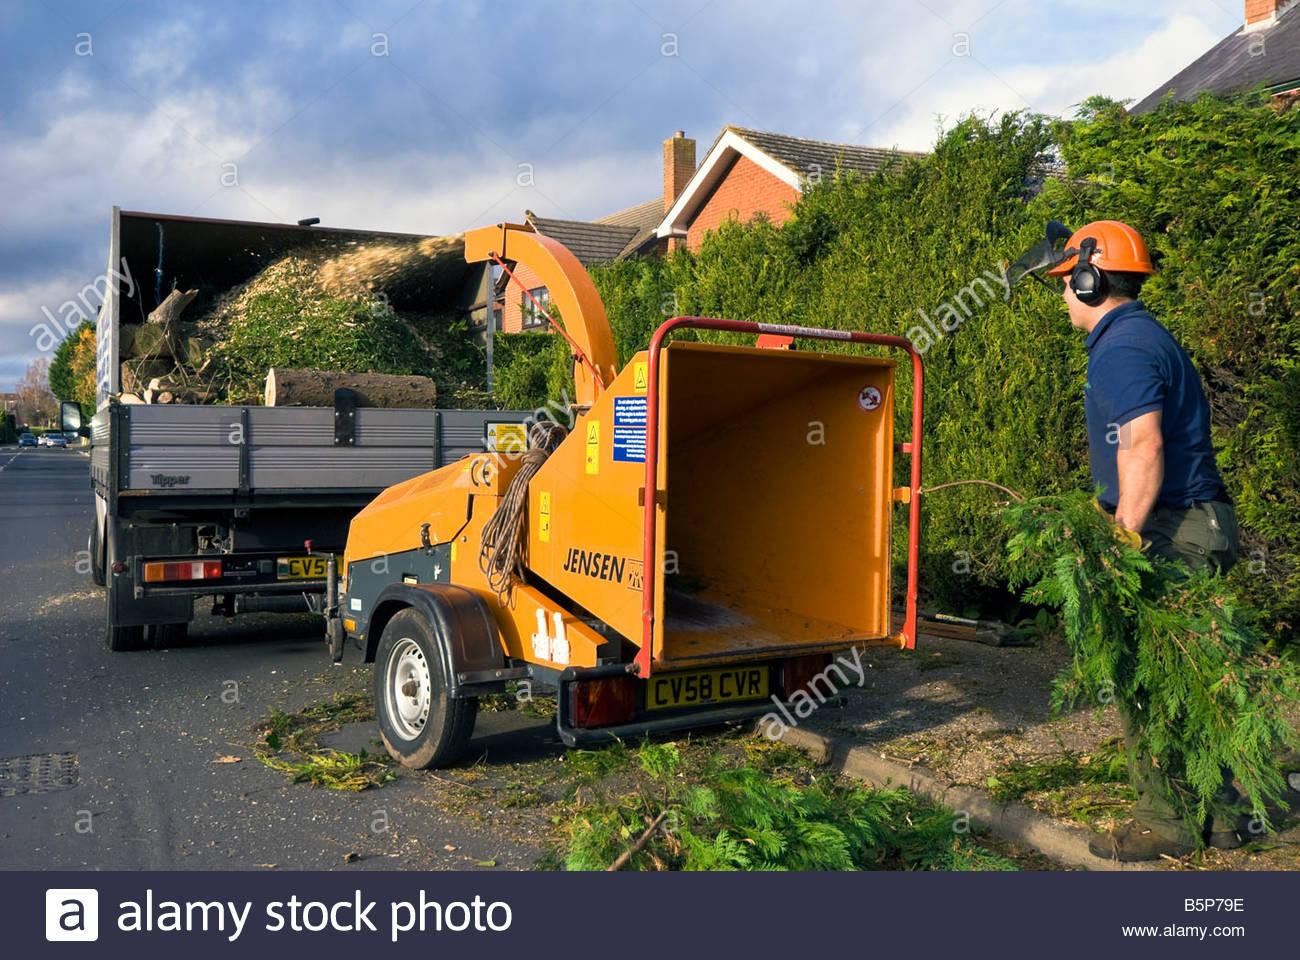 Berühmt Holz-Häcksler produziert Garten Mulch. Arbeiter mit Benzin &MG_25